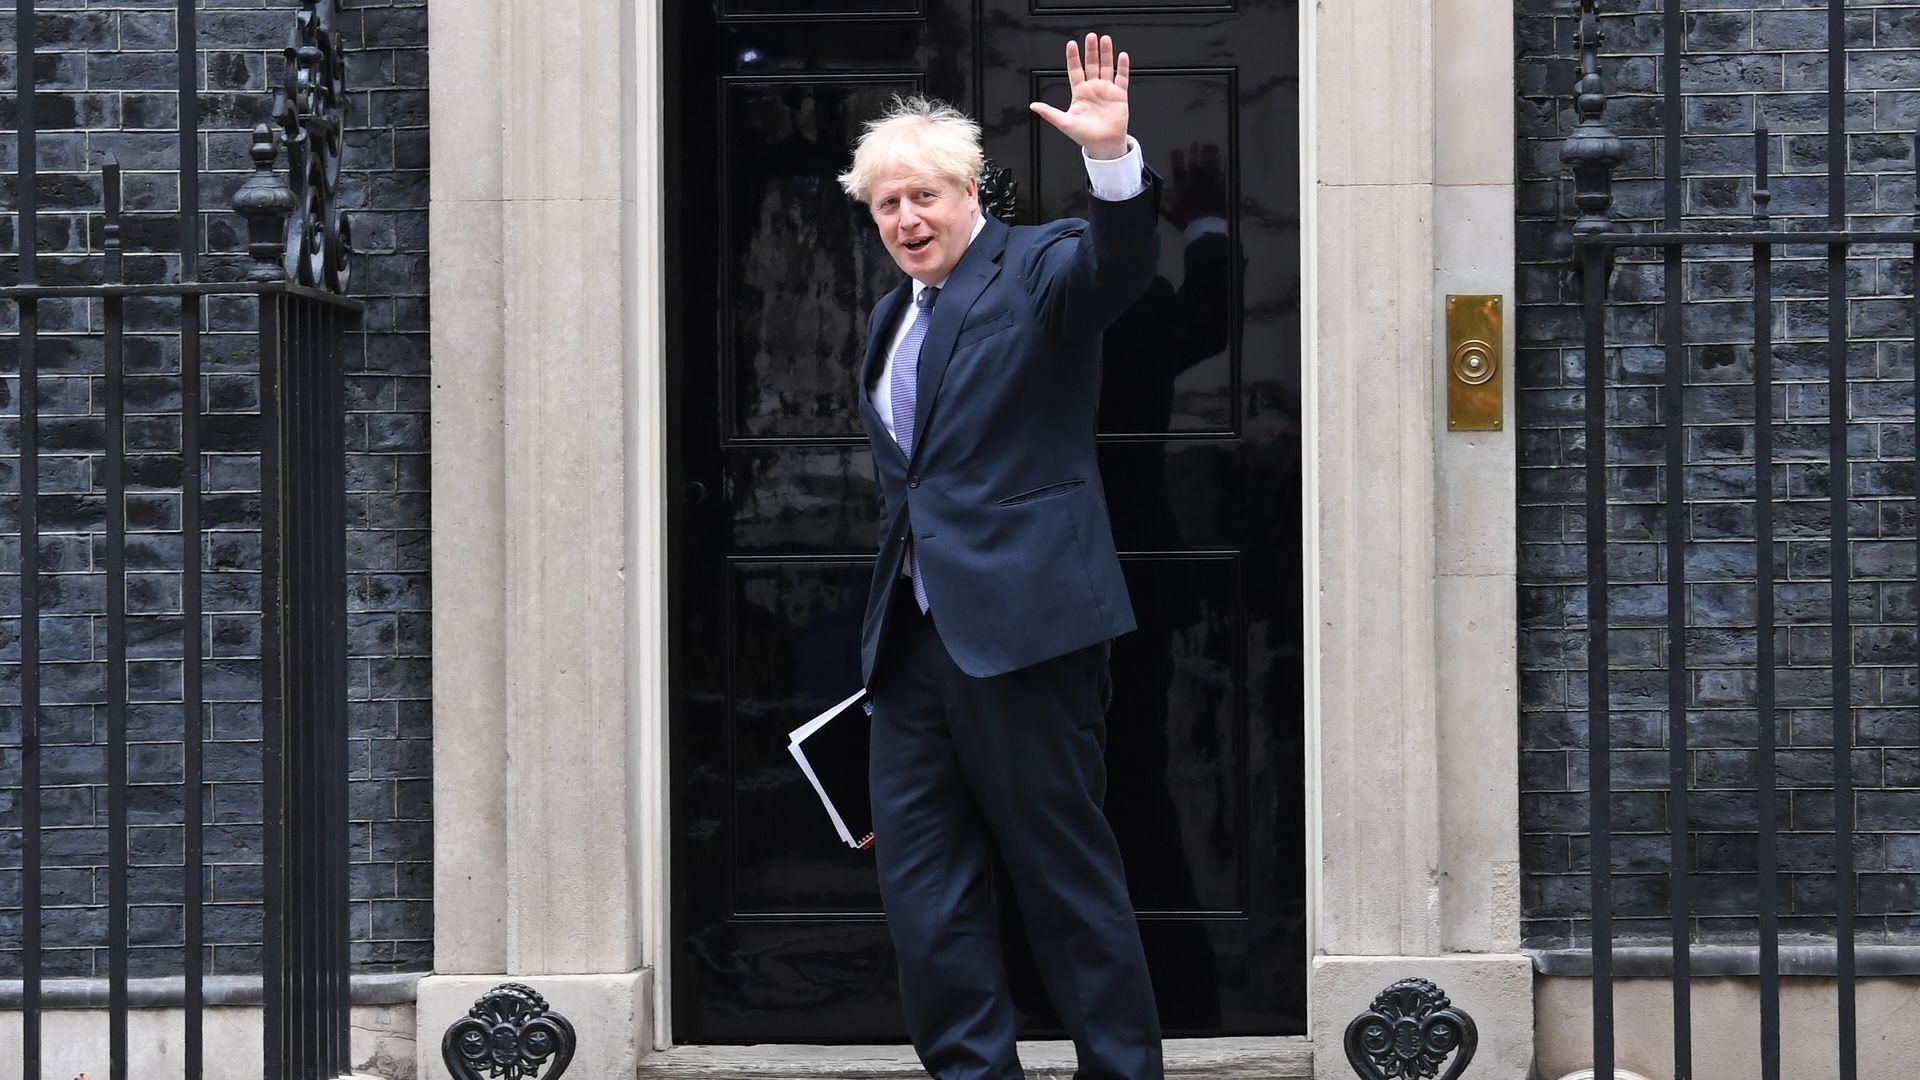 Prime minister Boris Johnson arrives at 10 Downing Street, London. - Credit: PA